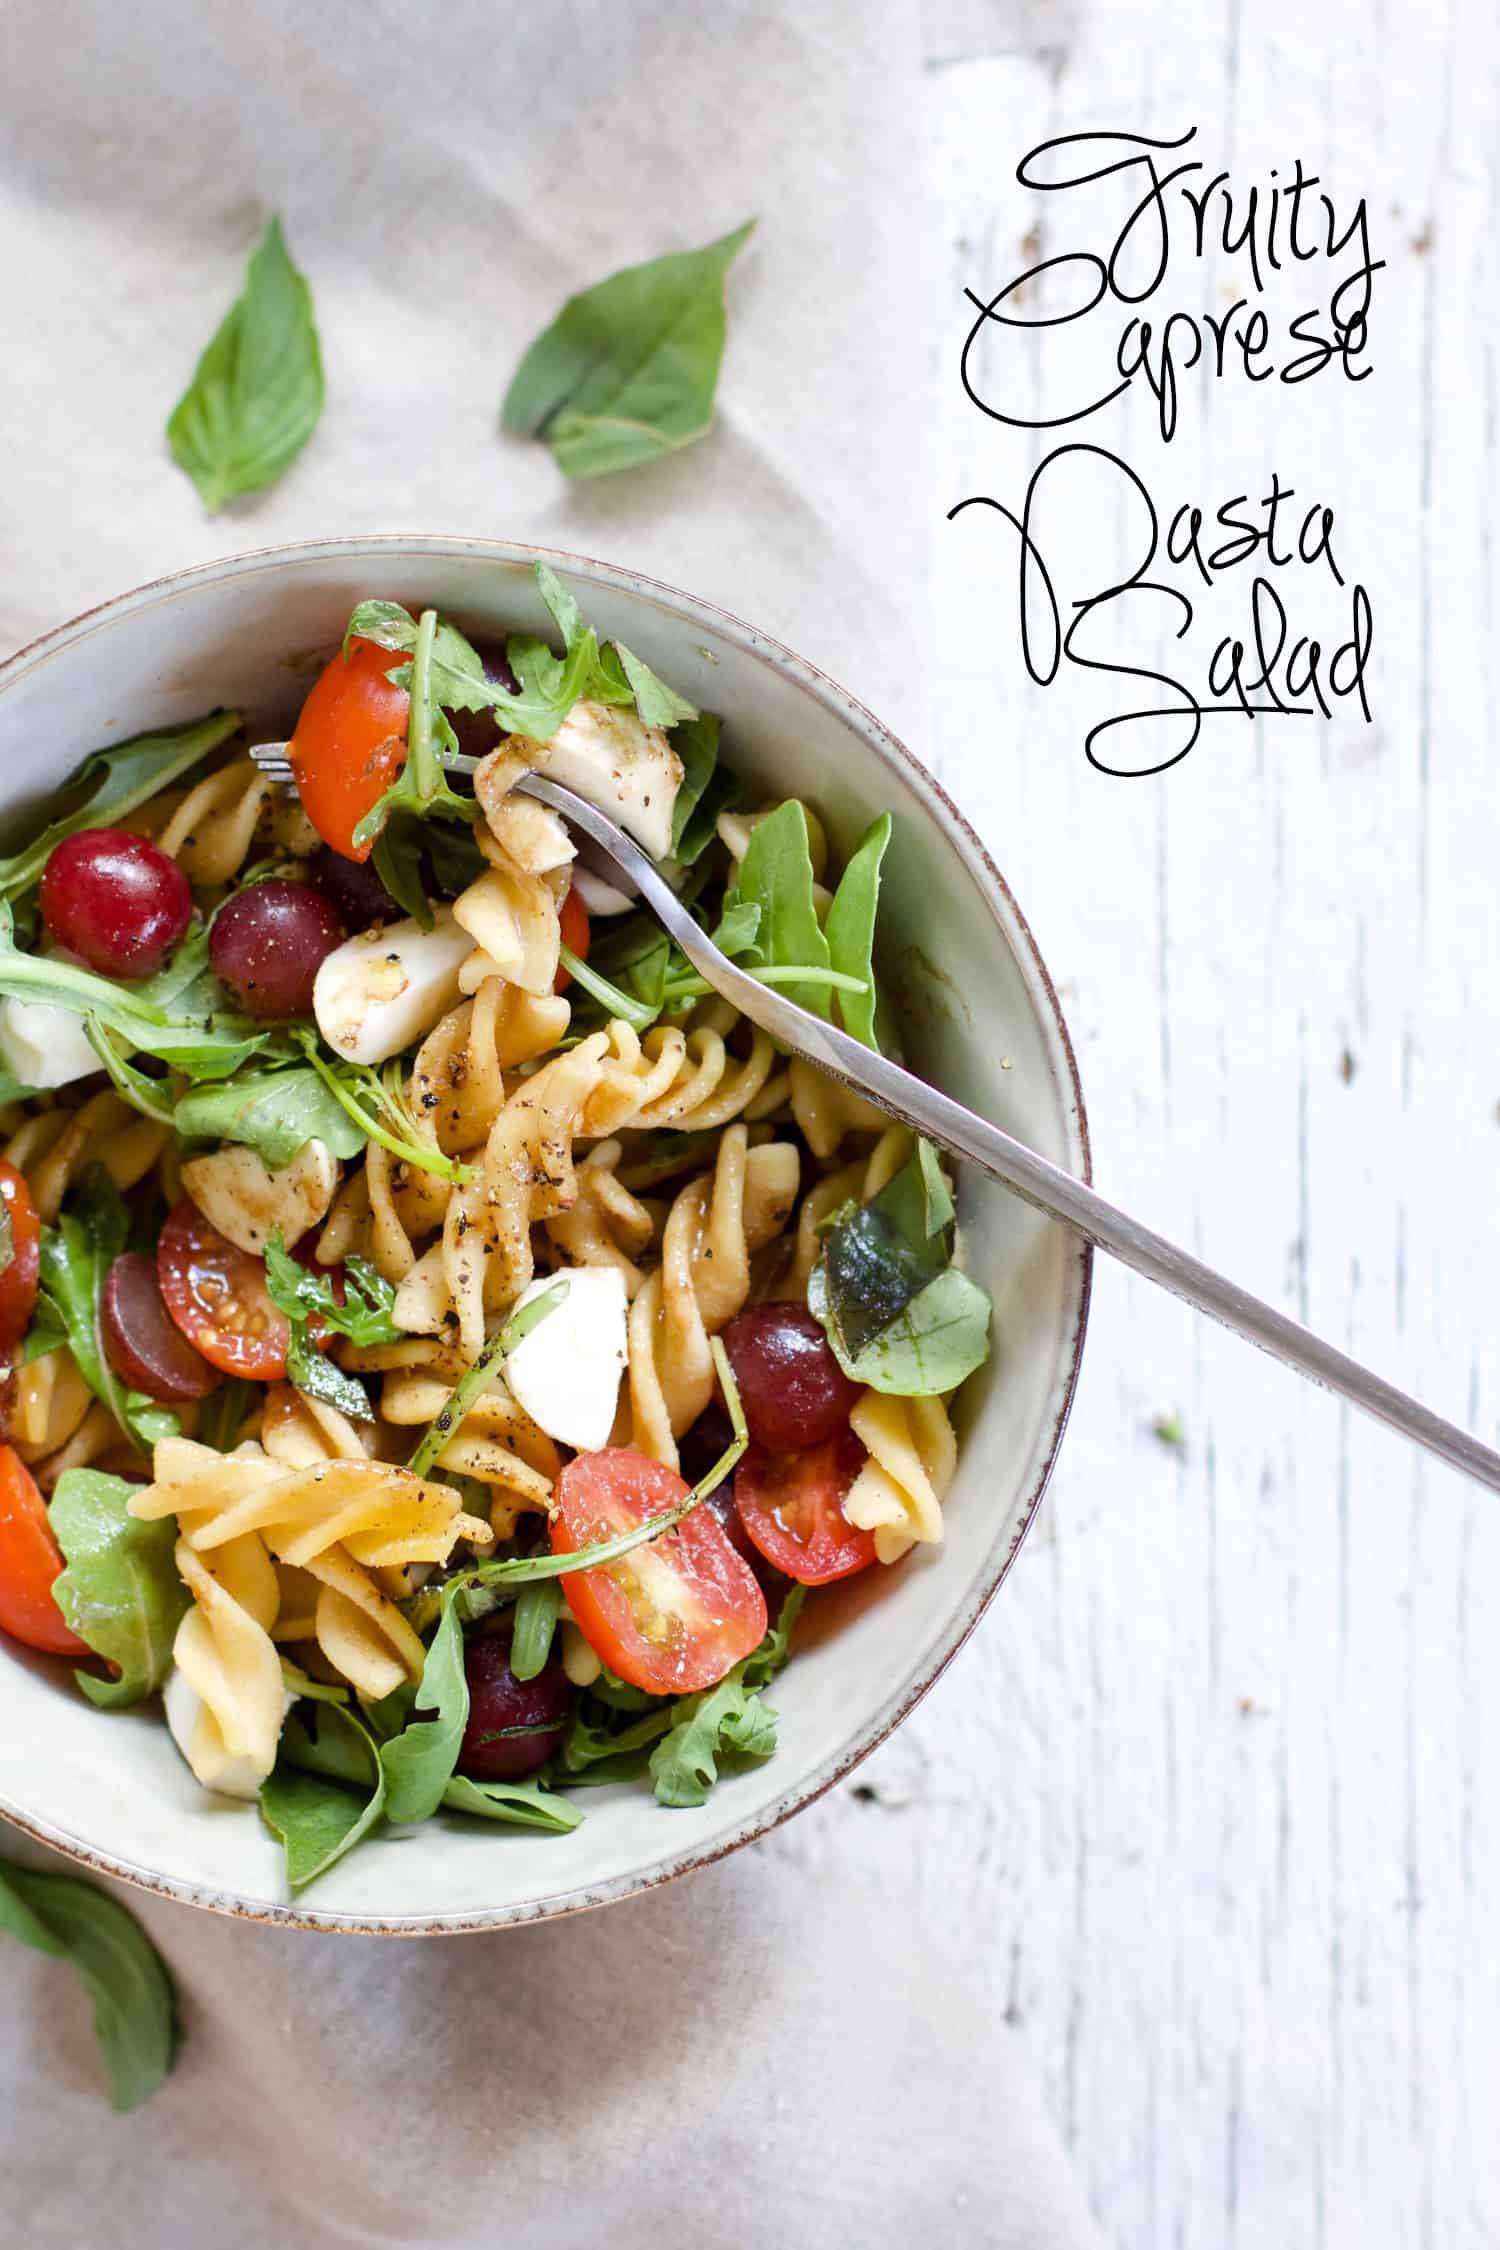 Fruity Caprese Pasta Salad - A fruity twist in the classic caprese salad! Summery, refreshing, perfect for picnics. Grapes, grape tomatoes, fresh mozzarrella, arugula, basil, olive oil & balsamic | rootsandradishes.com